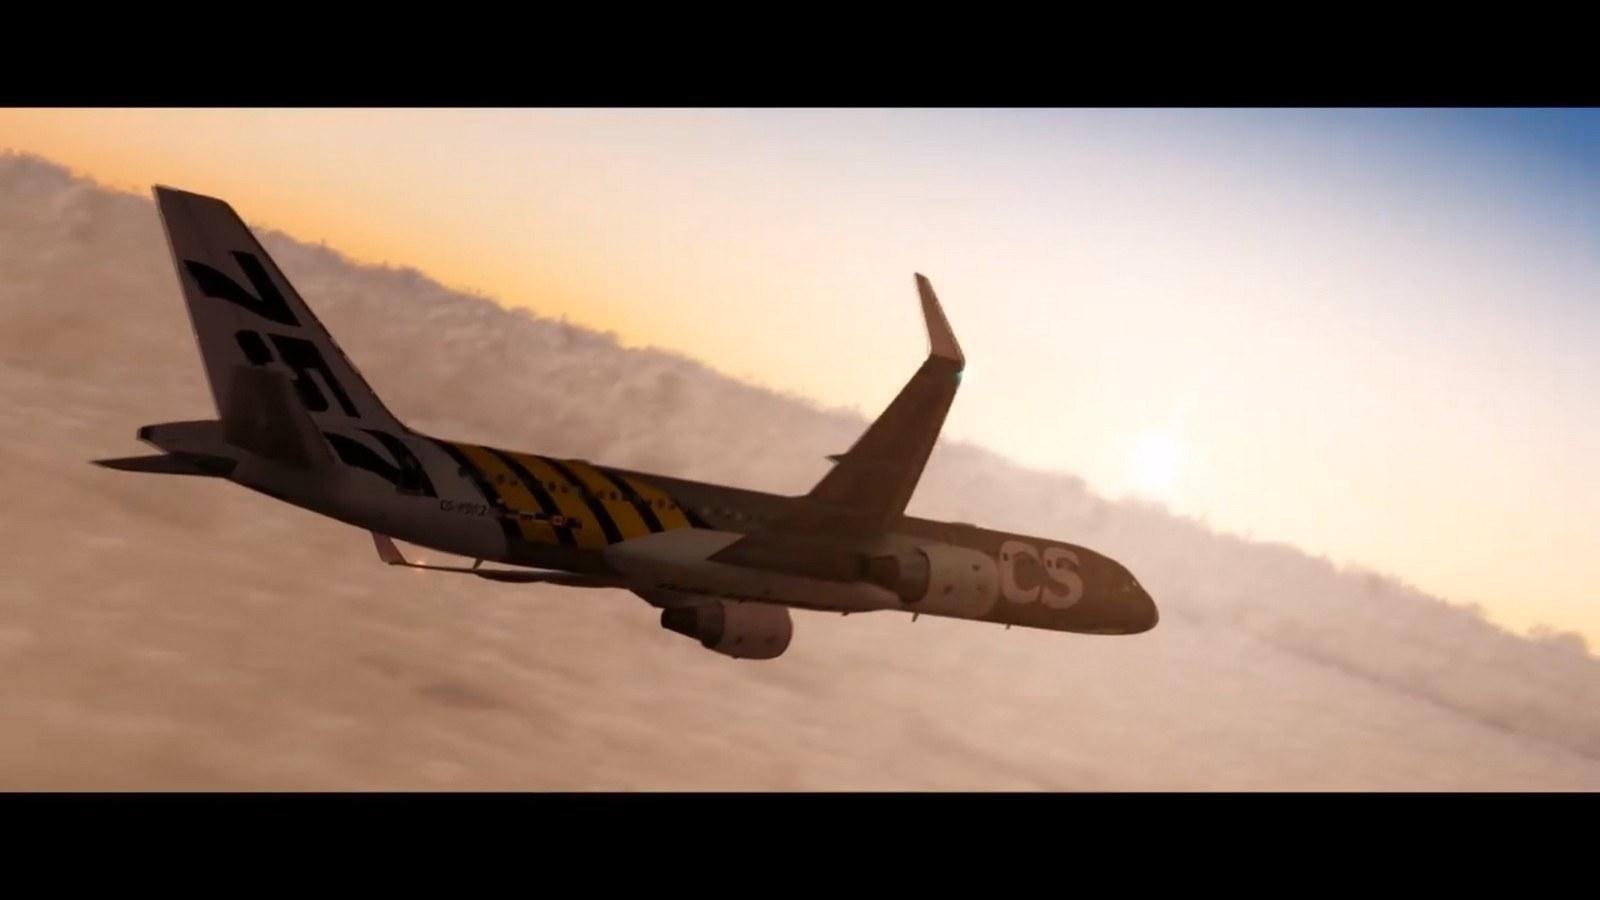 Captain Sim Make the 757 Captain III Manual Available